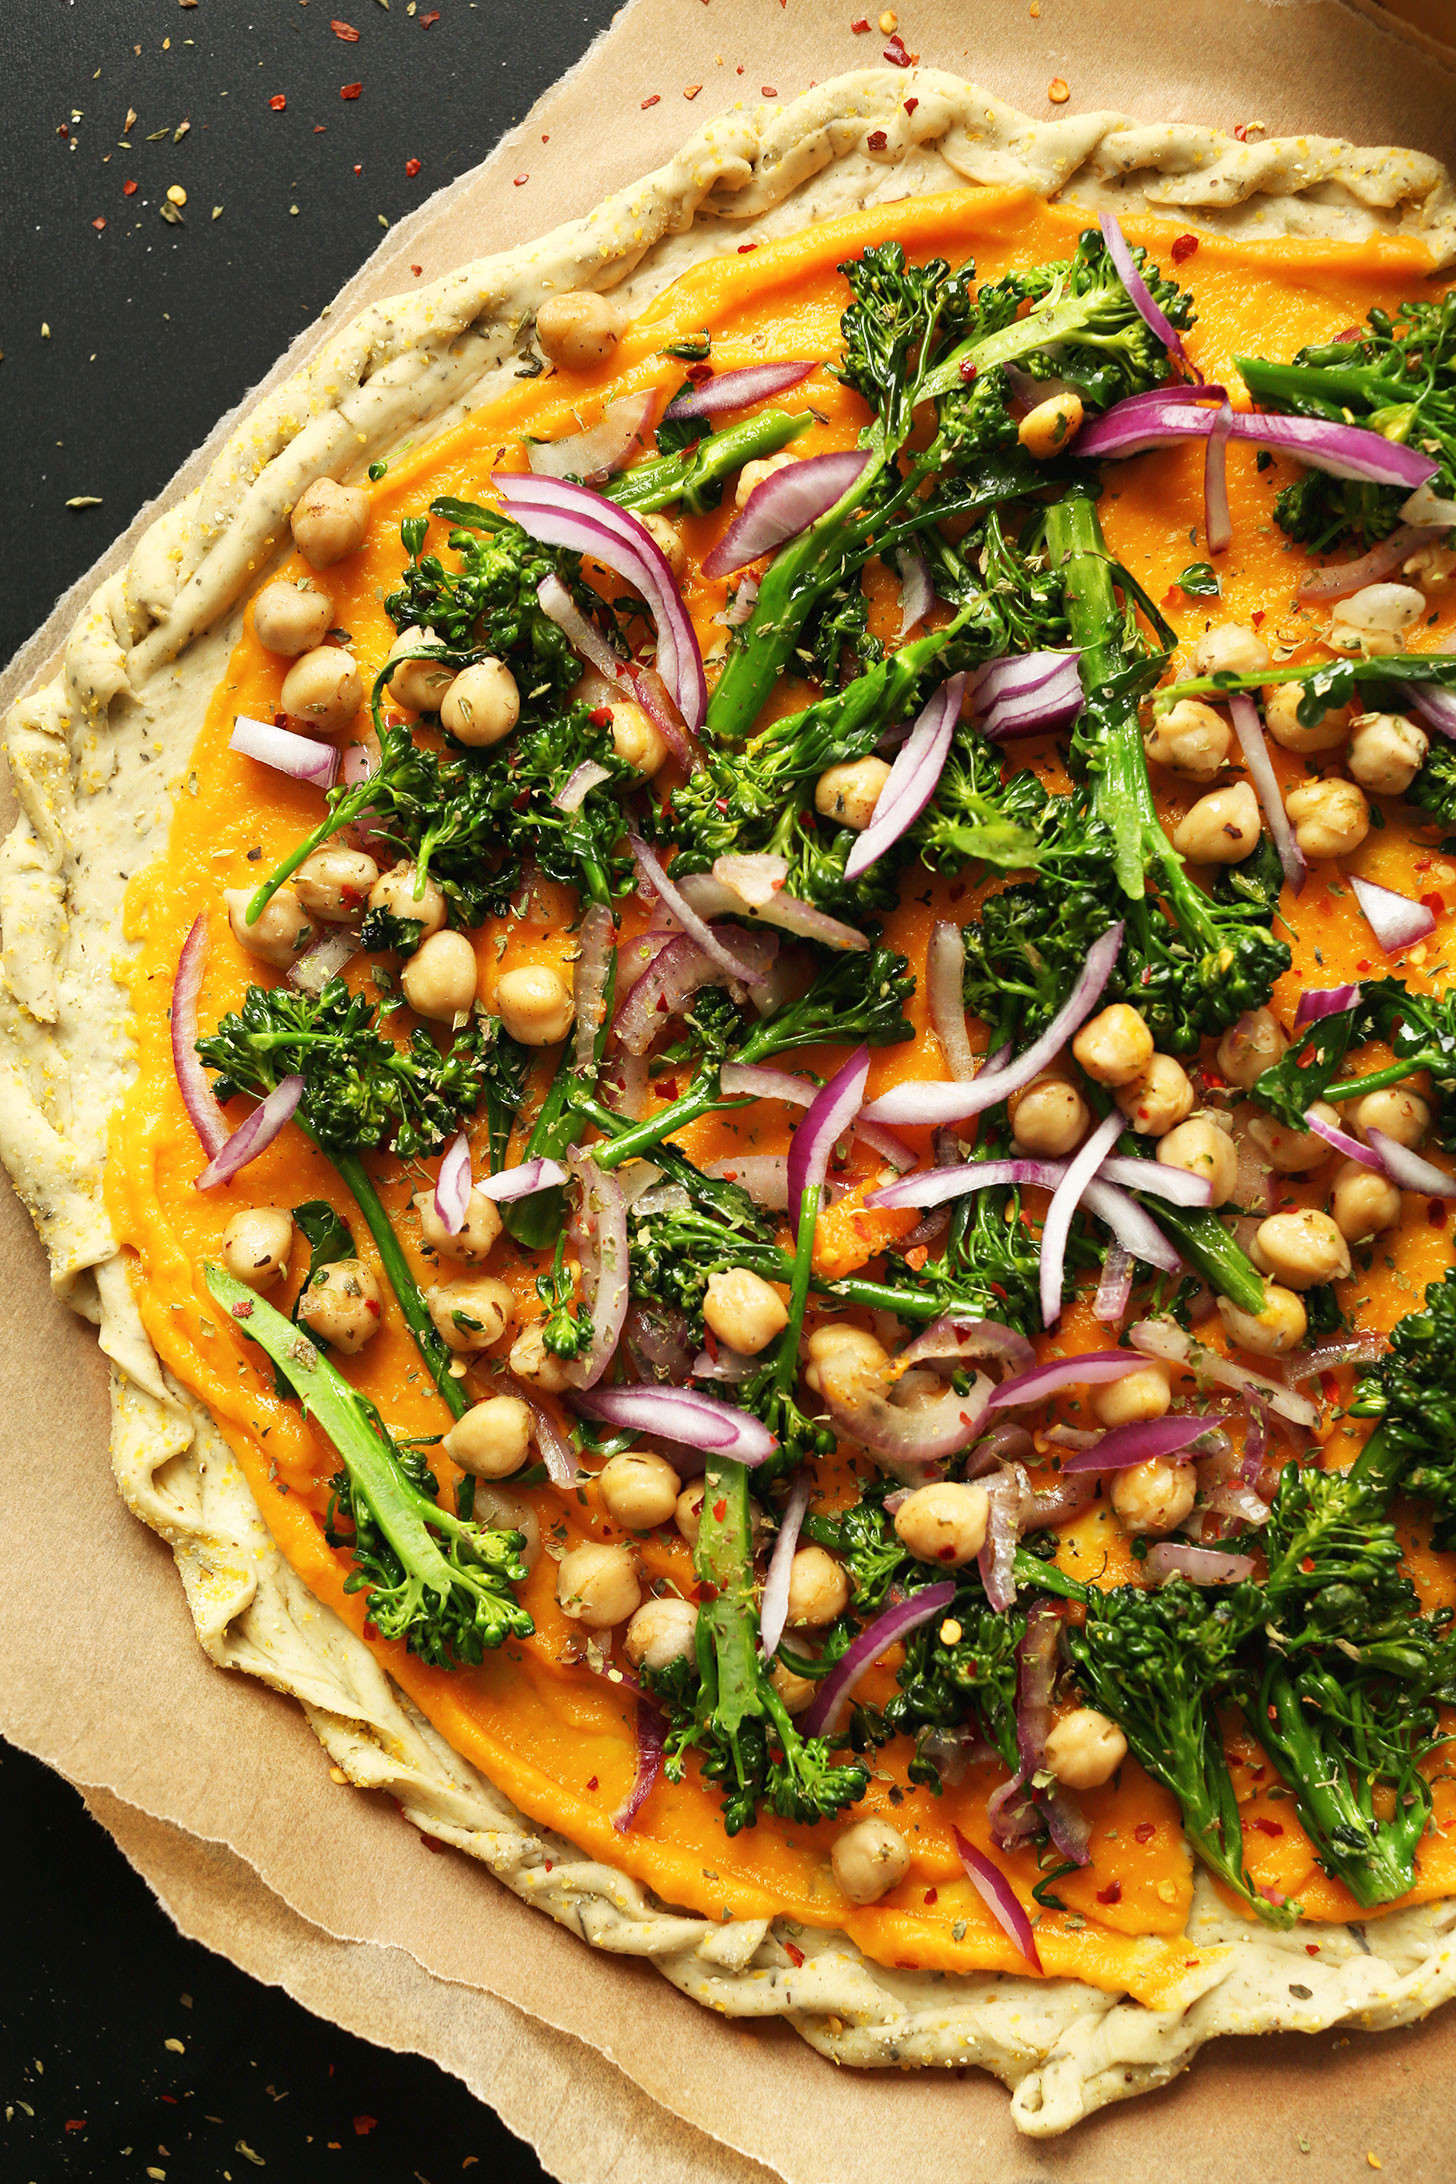 Healthy Vegan Dinner Recipes  30 delicious vegan dinner recipes for happy tummies